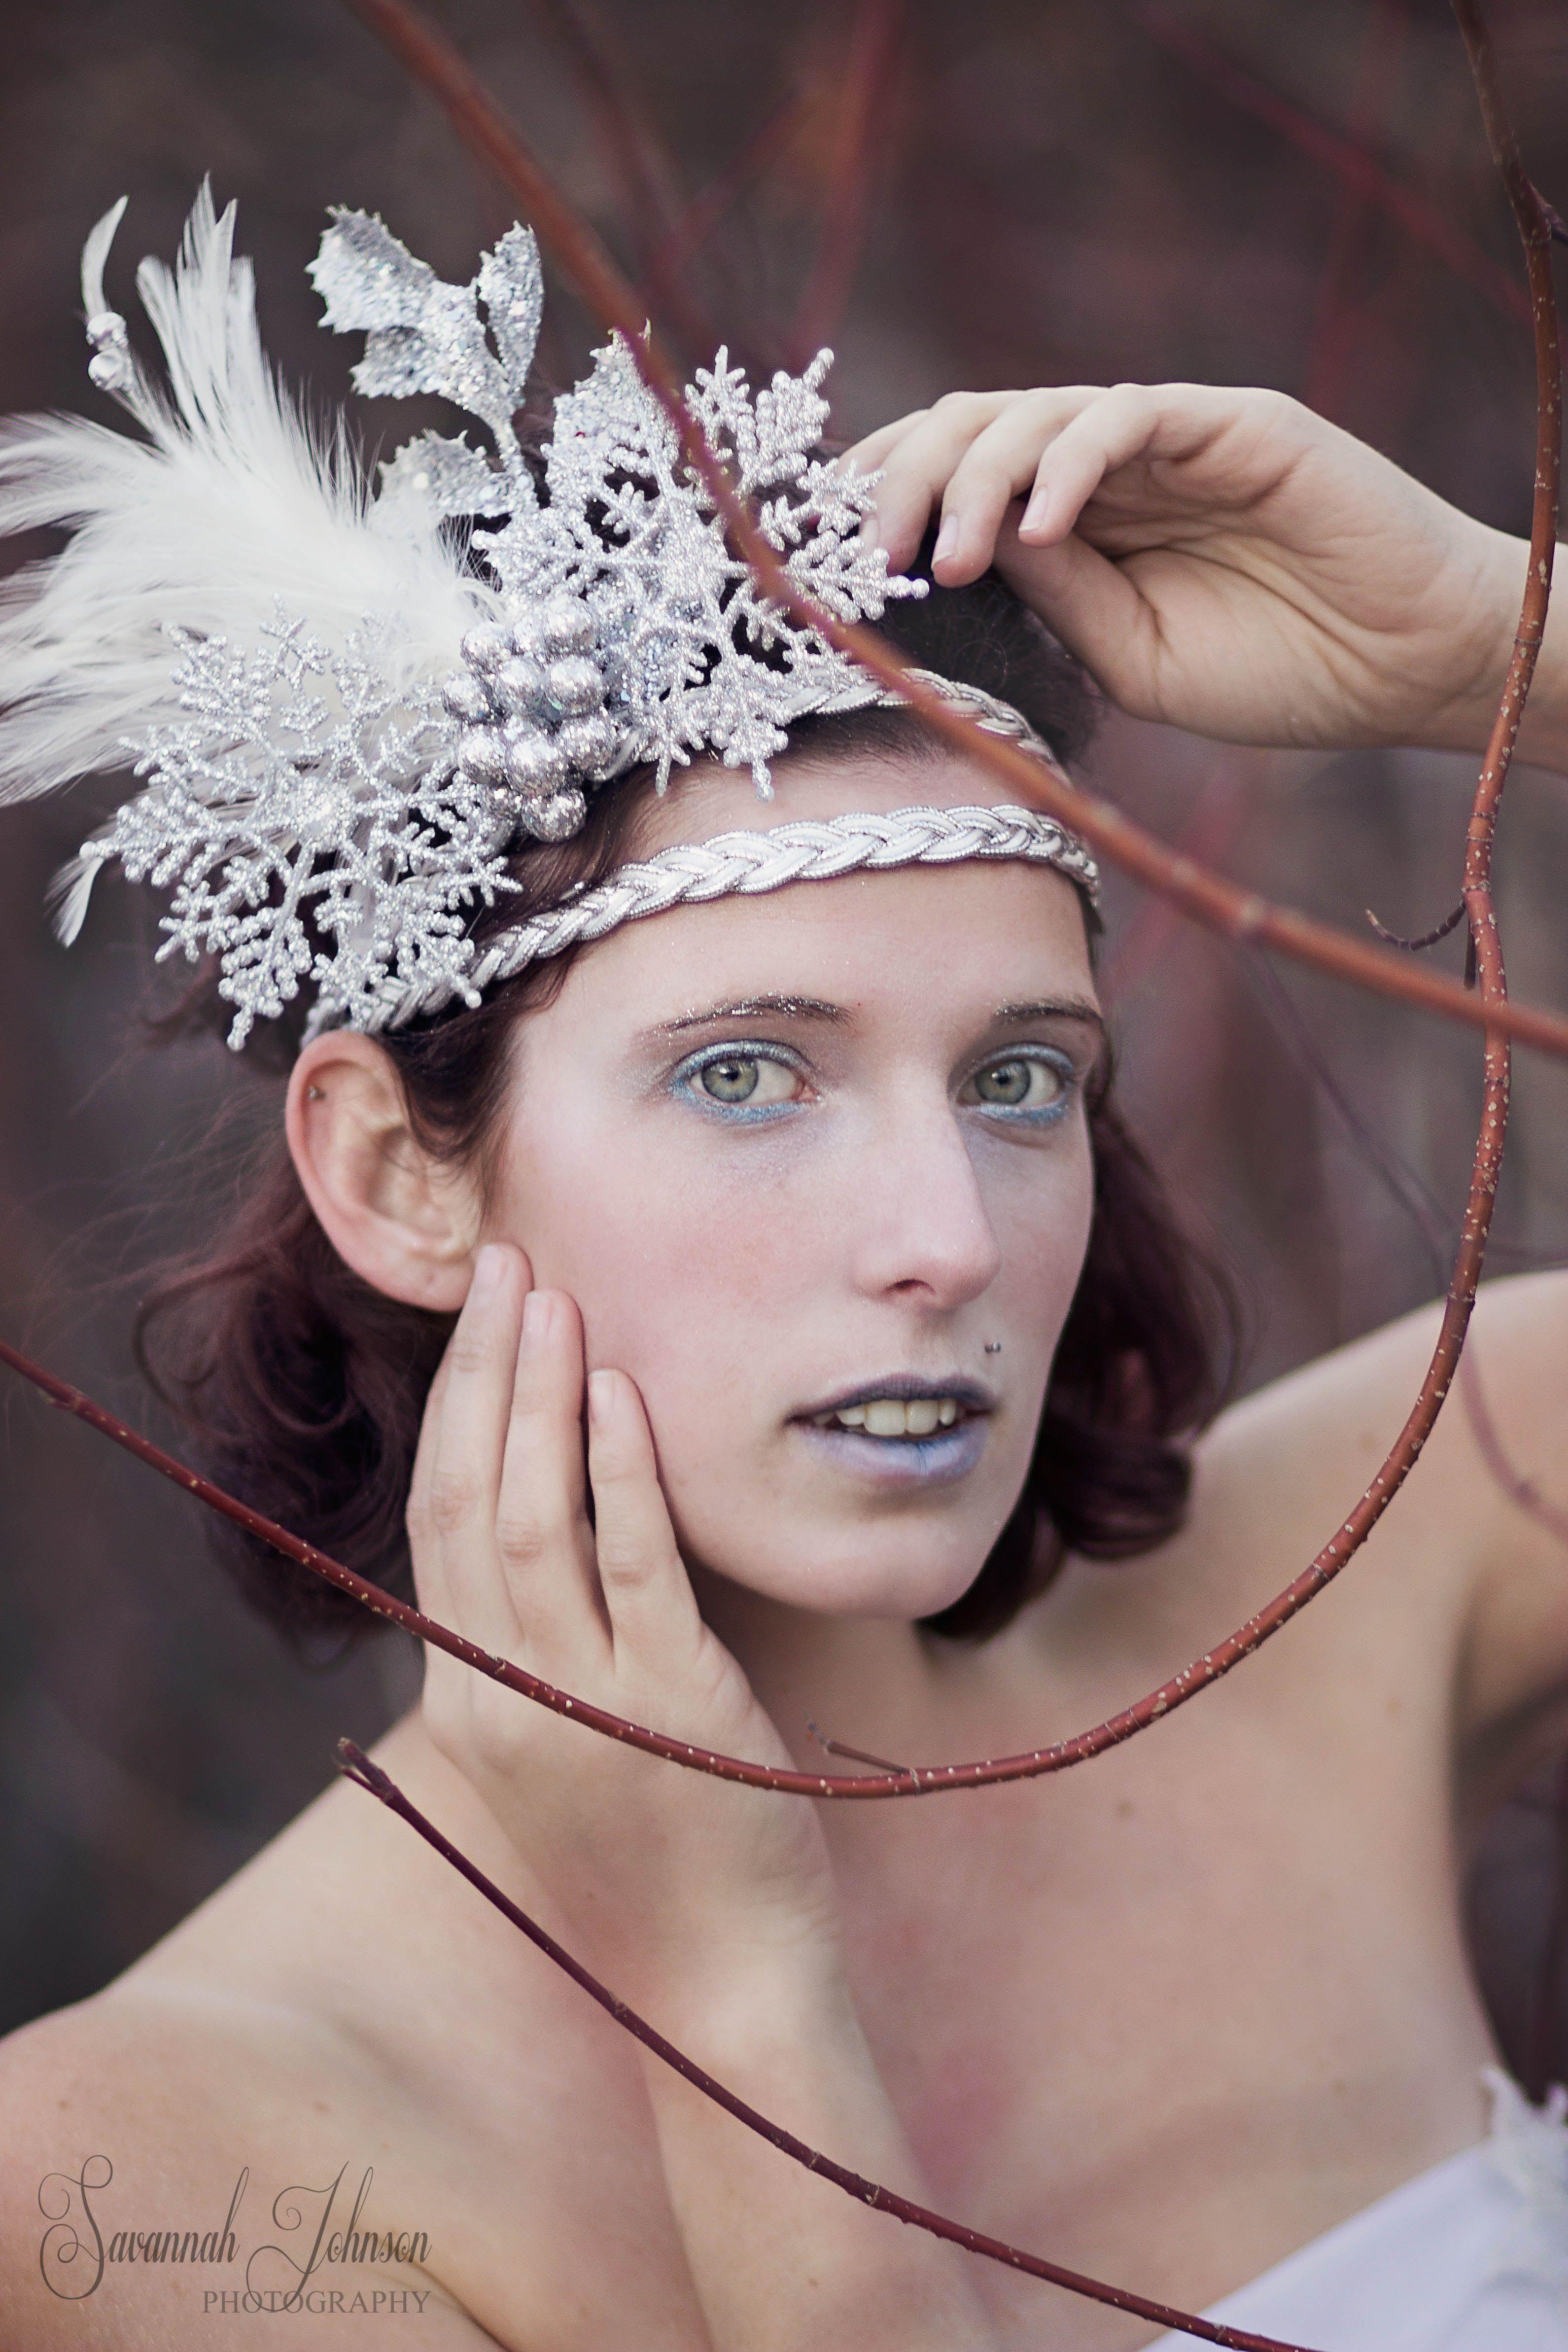 #icequeen #mirrormirrorproject